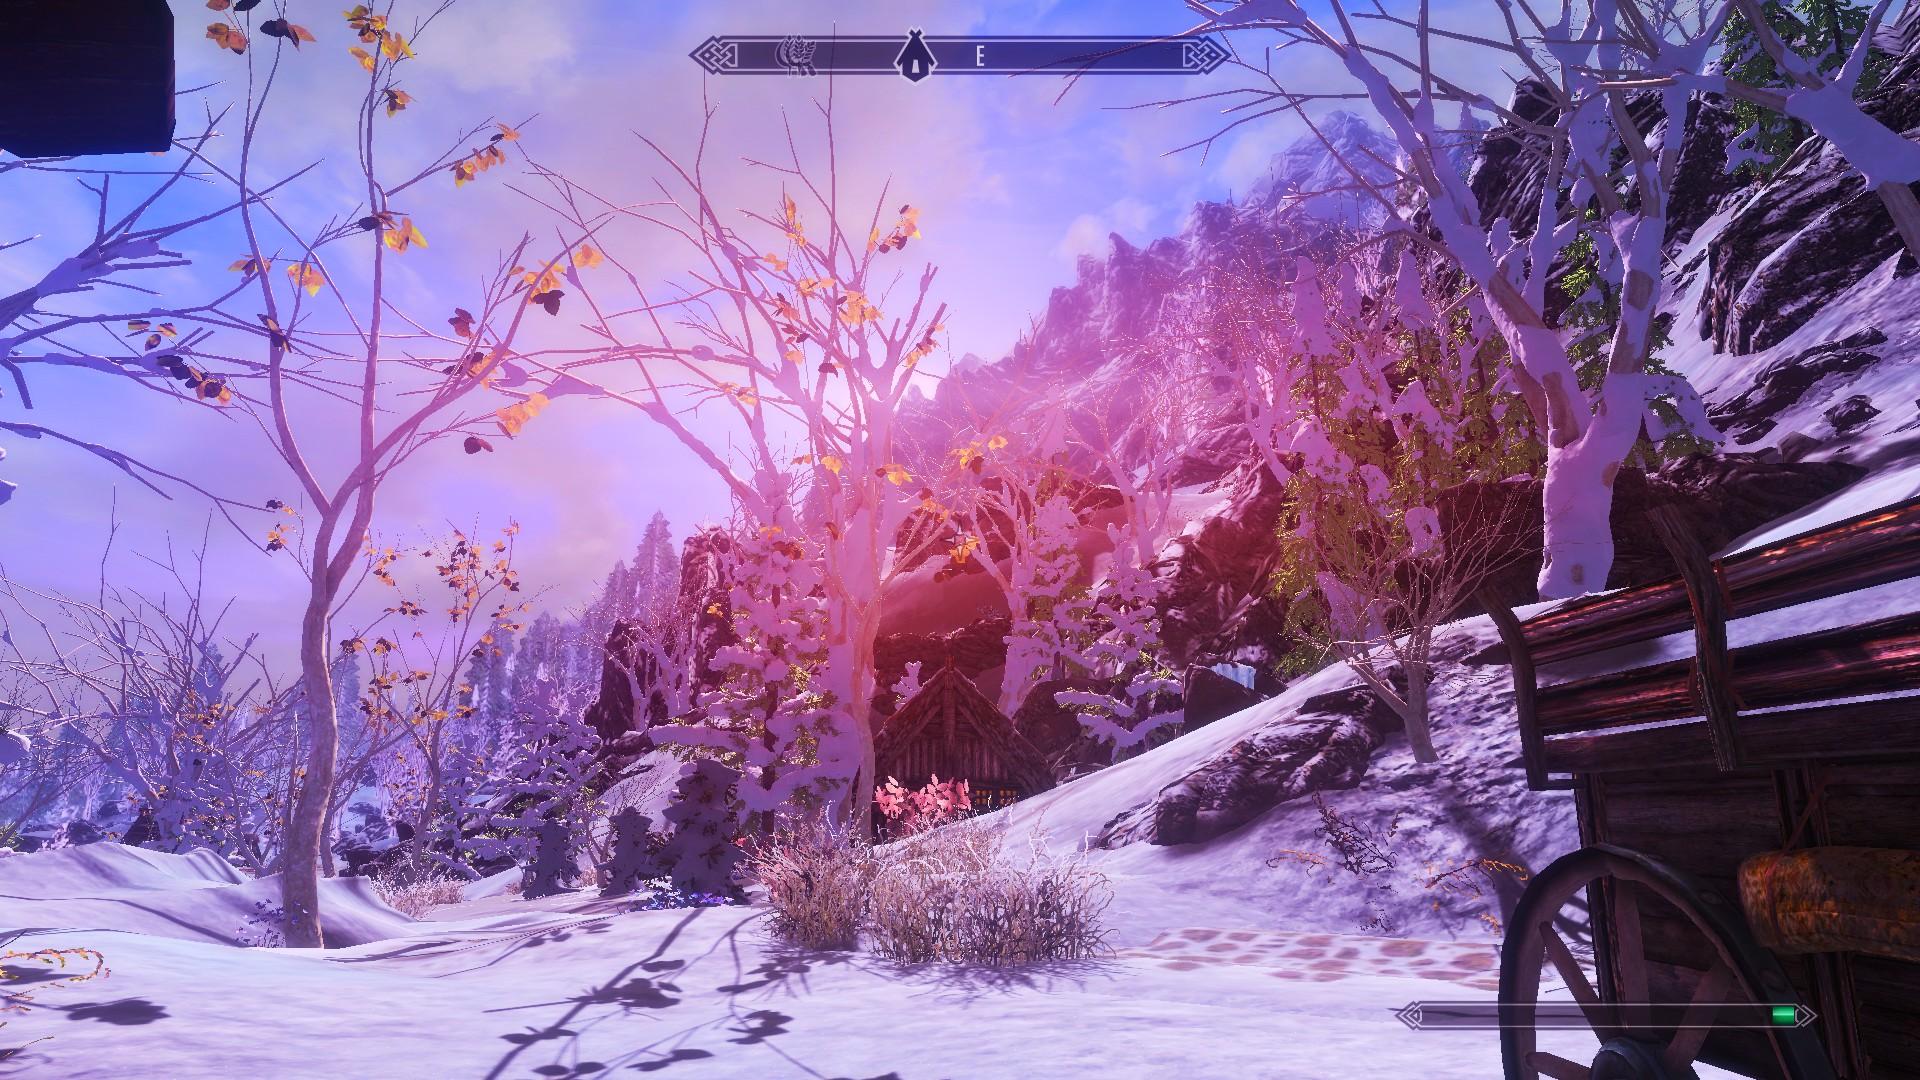 20180311111145_1.jpg - Elder Scrolls 5: Skyrim, the